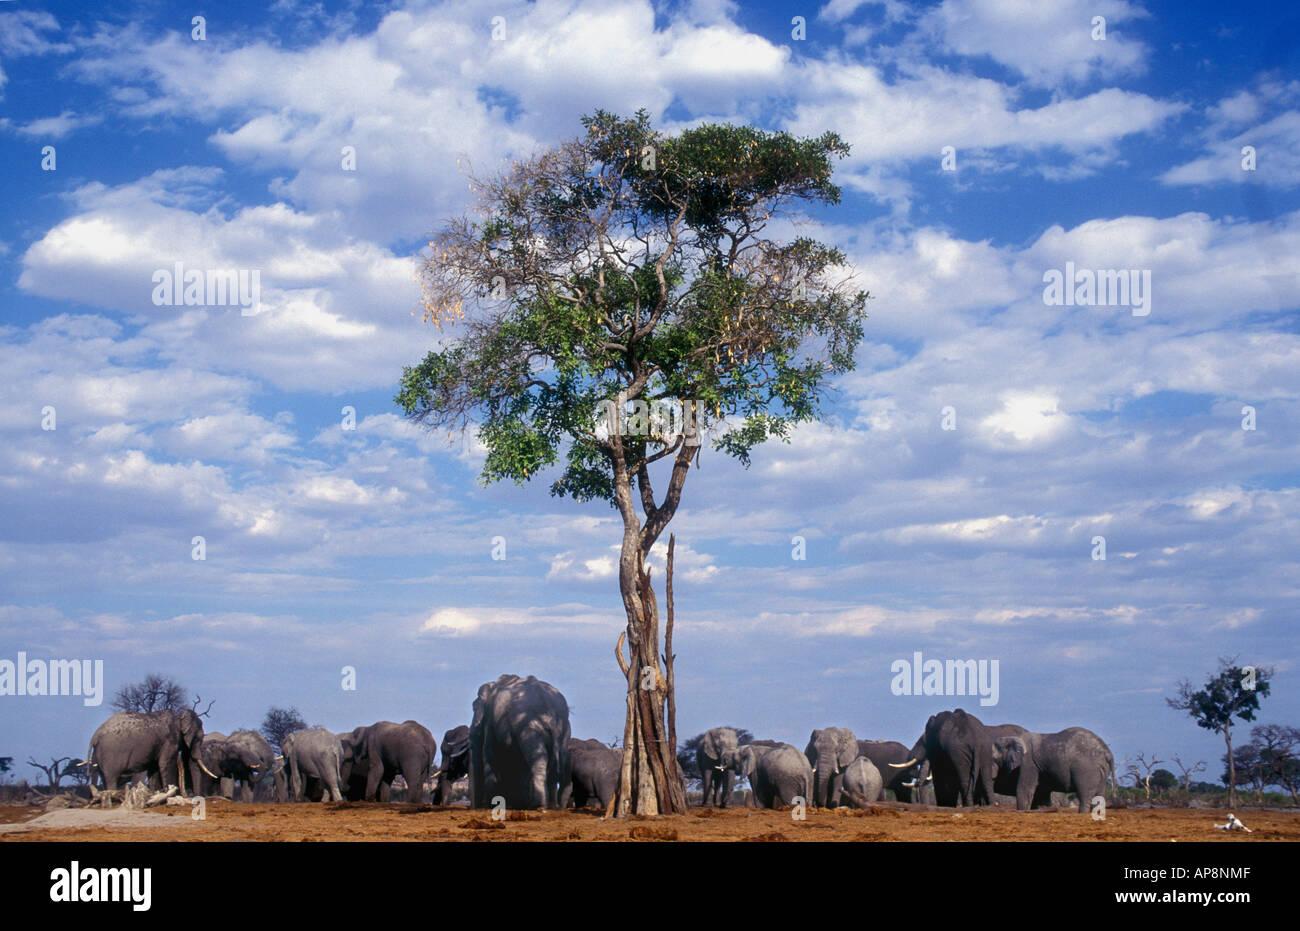 Elephant family herd clustered around tree and waterhole near Savuti South Camp Chobe National Park Botswana Stock Photo